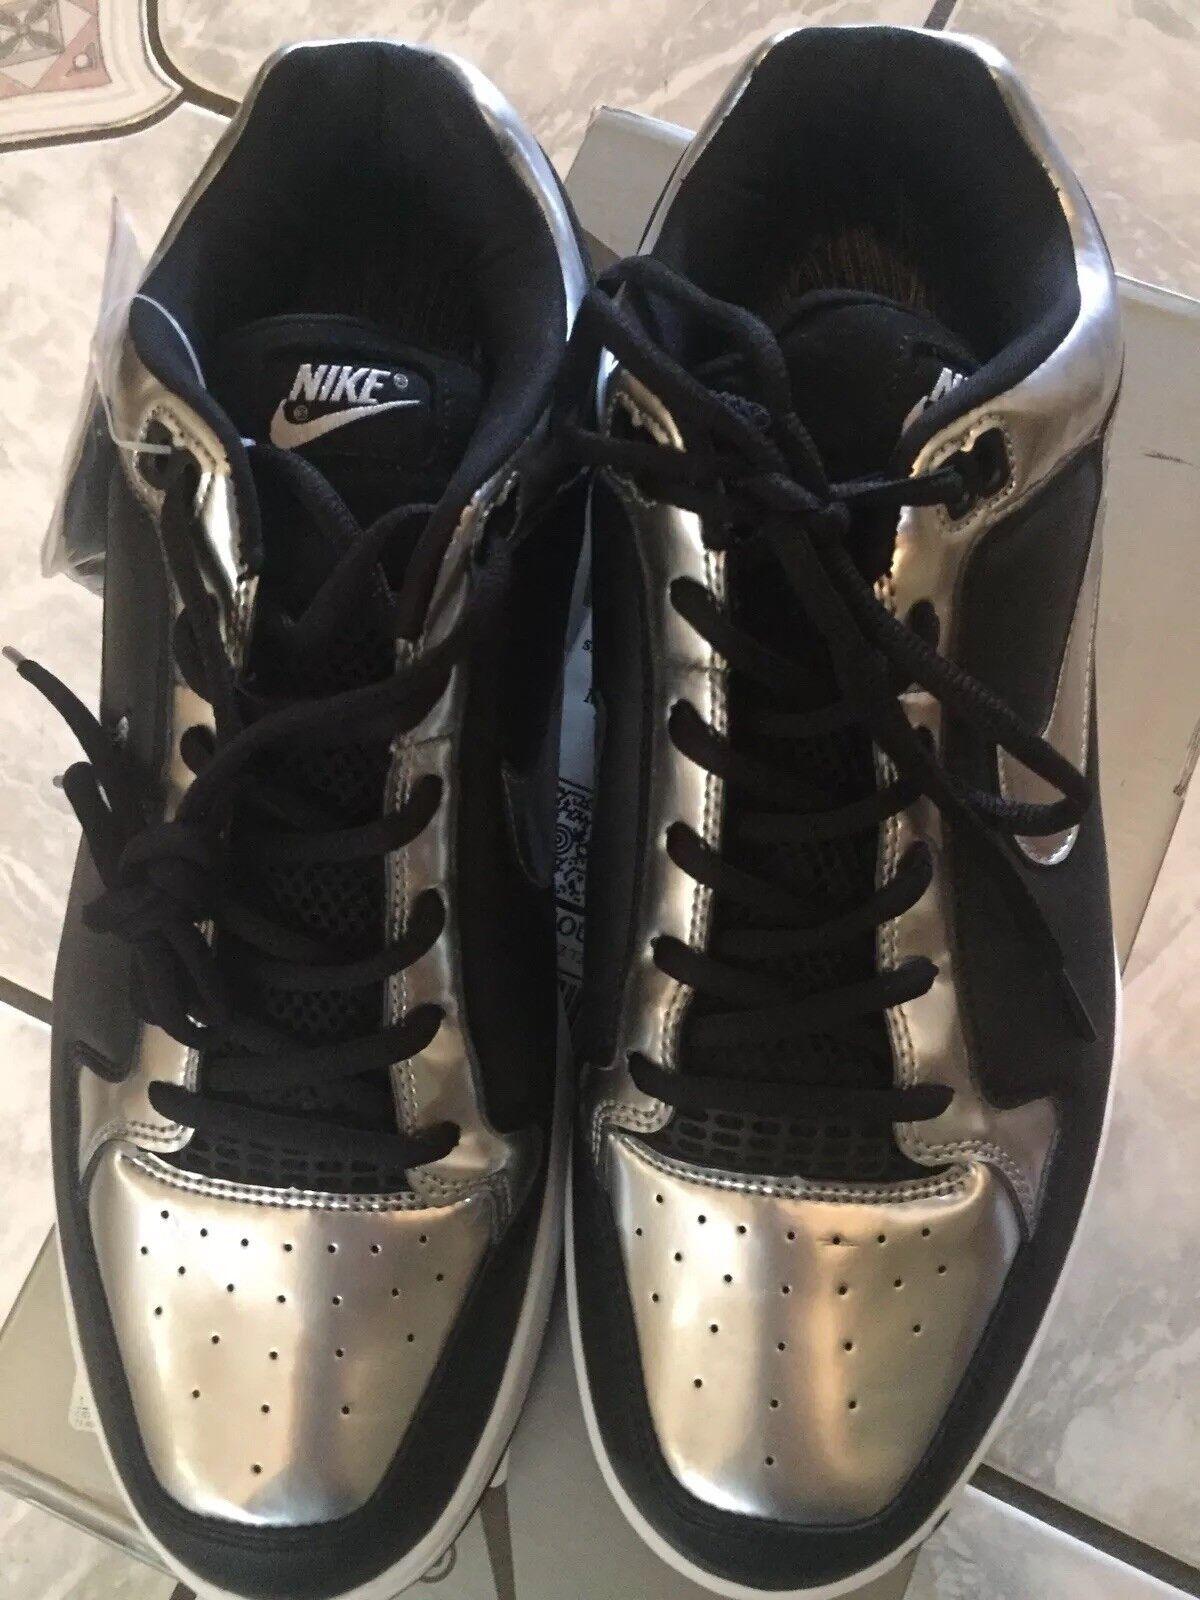 Nike zoom air angus scarpe uomo pennino nero / silver raiders pennino uomo milioni 7240e4